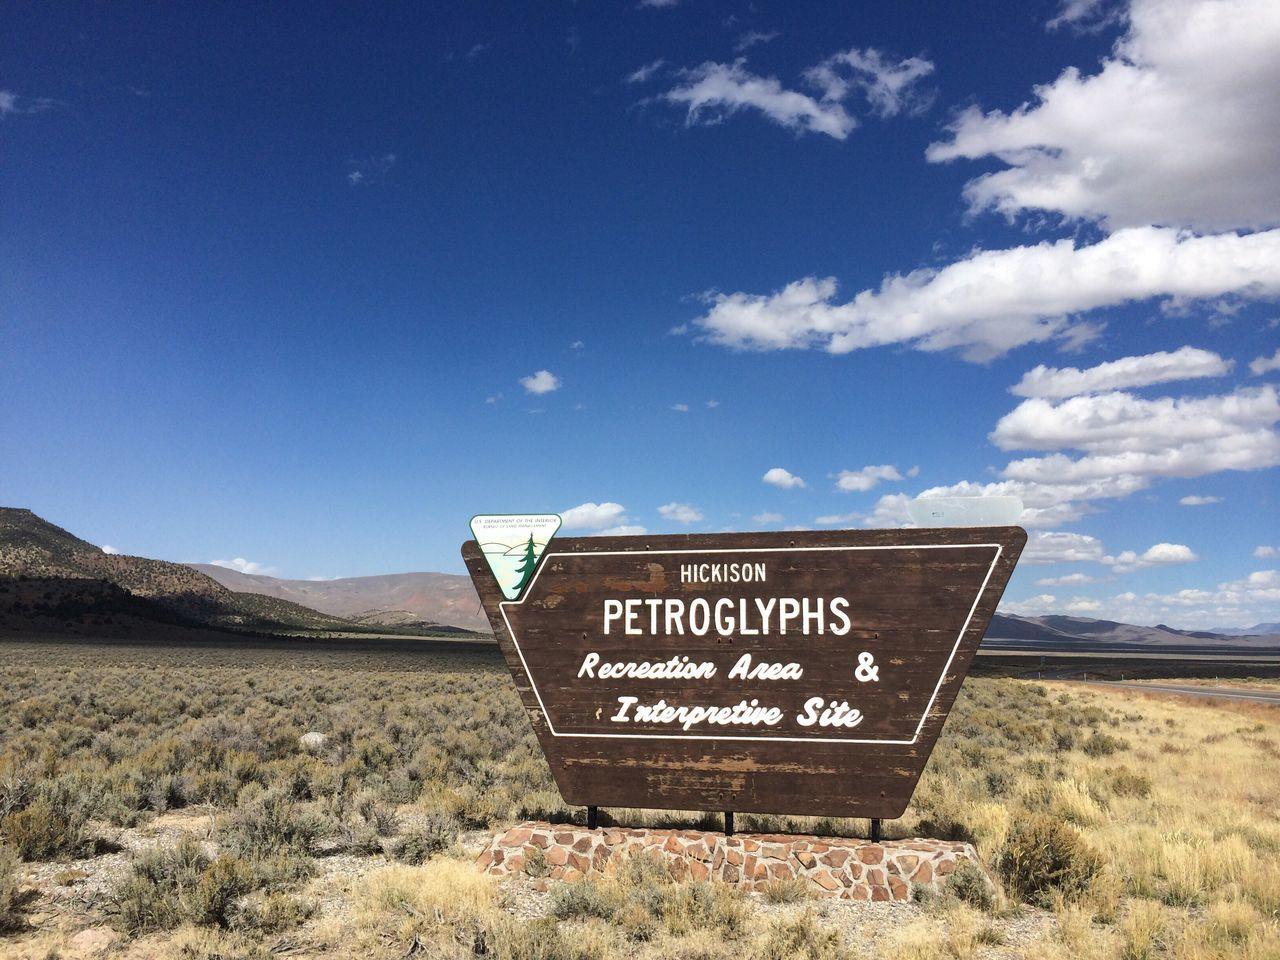 Hickson Petroglyphs Nevada Desert Highway 50 Ancient Native Americans